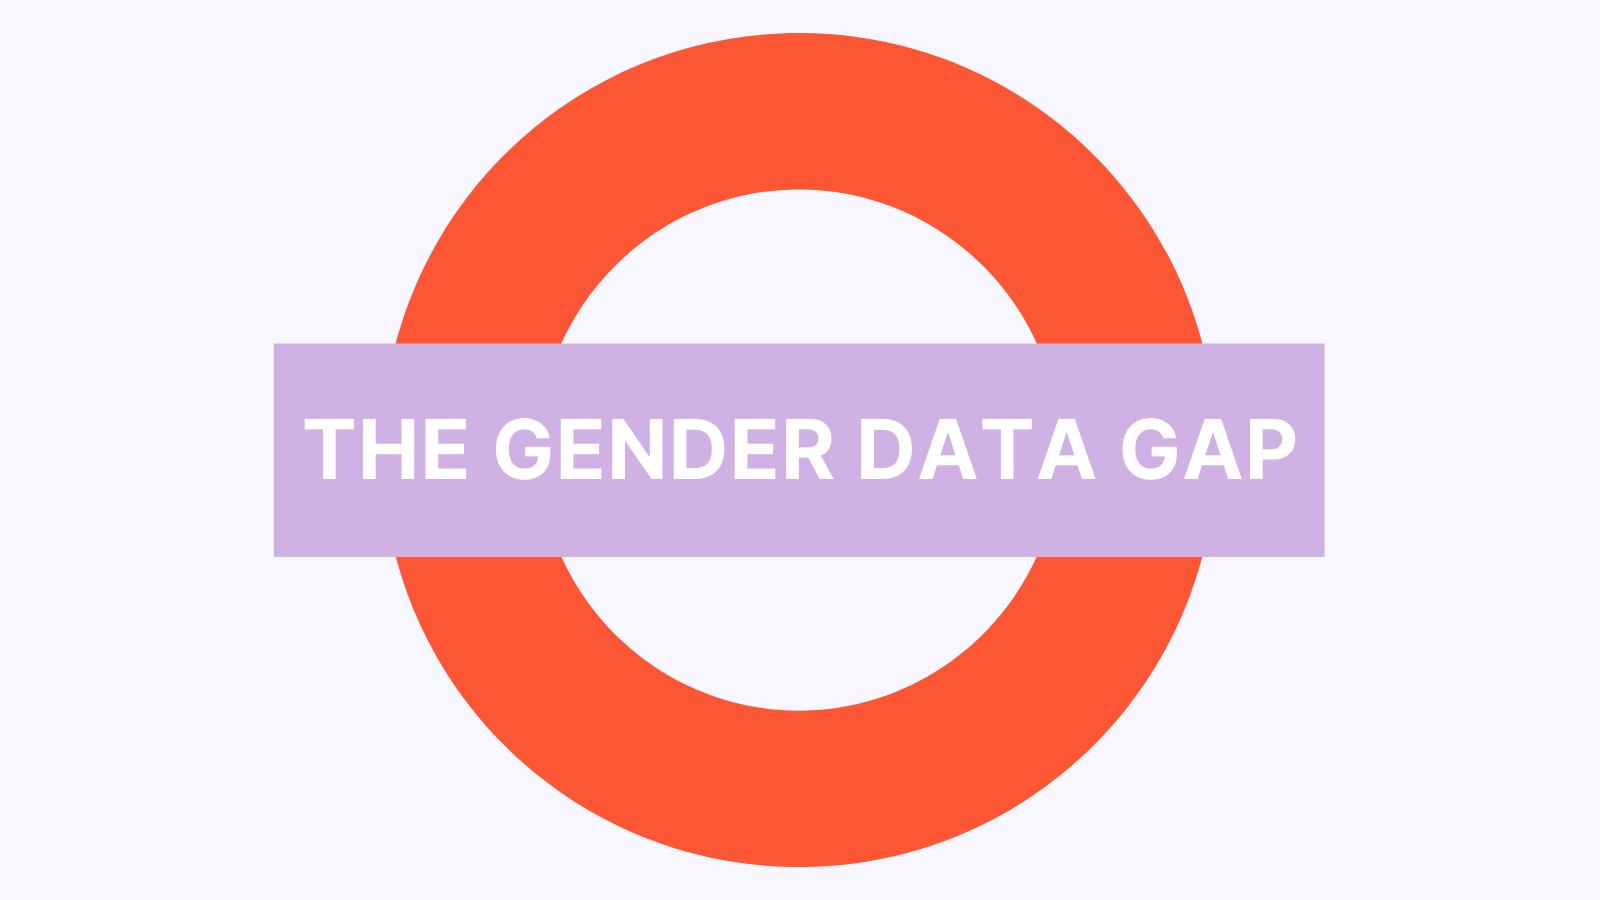 The gender data gap image